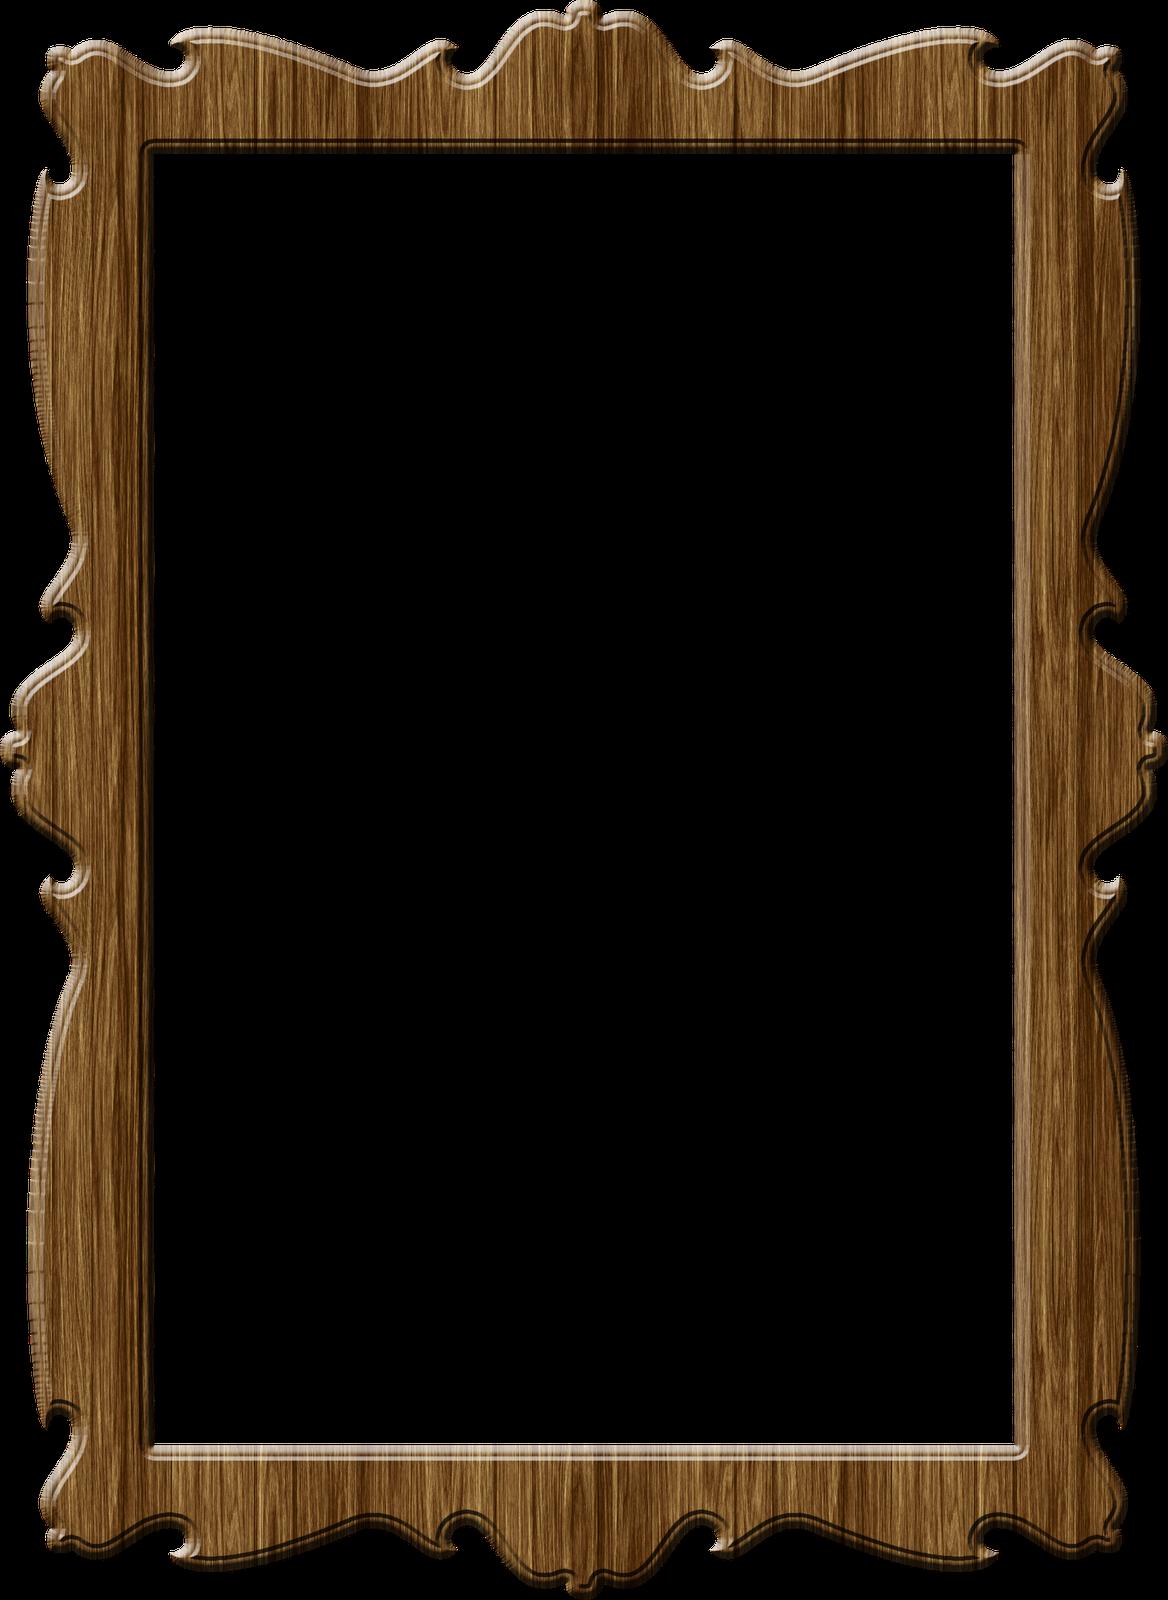 Marcos de madera imagui - Marcos de madera ...